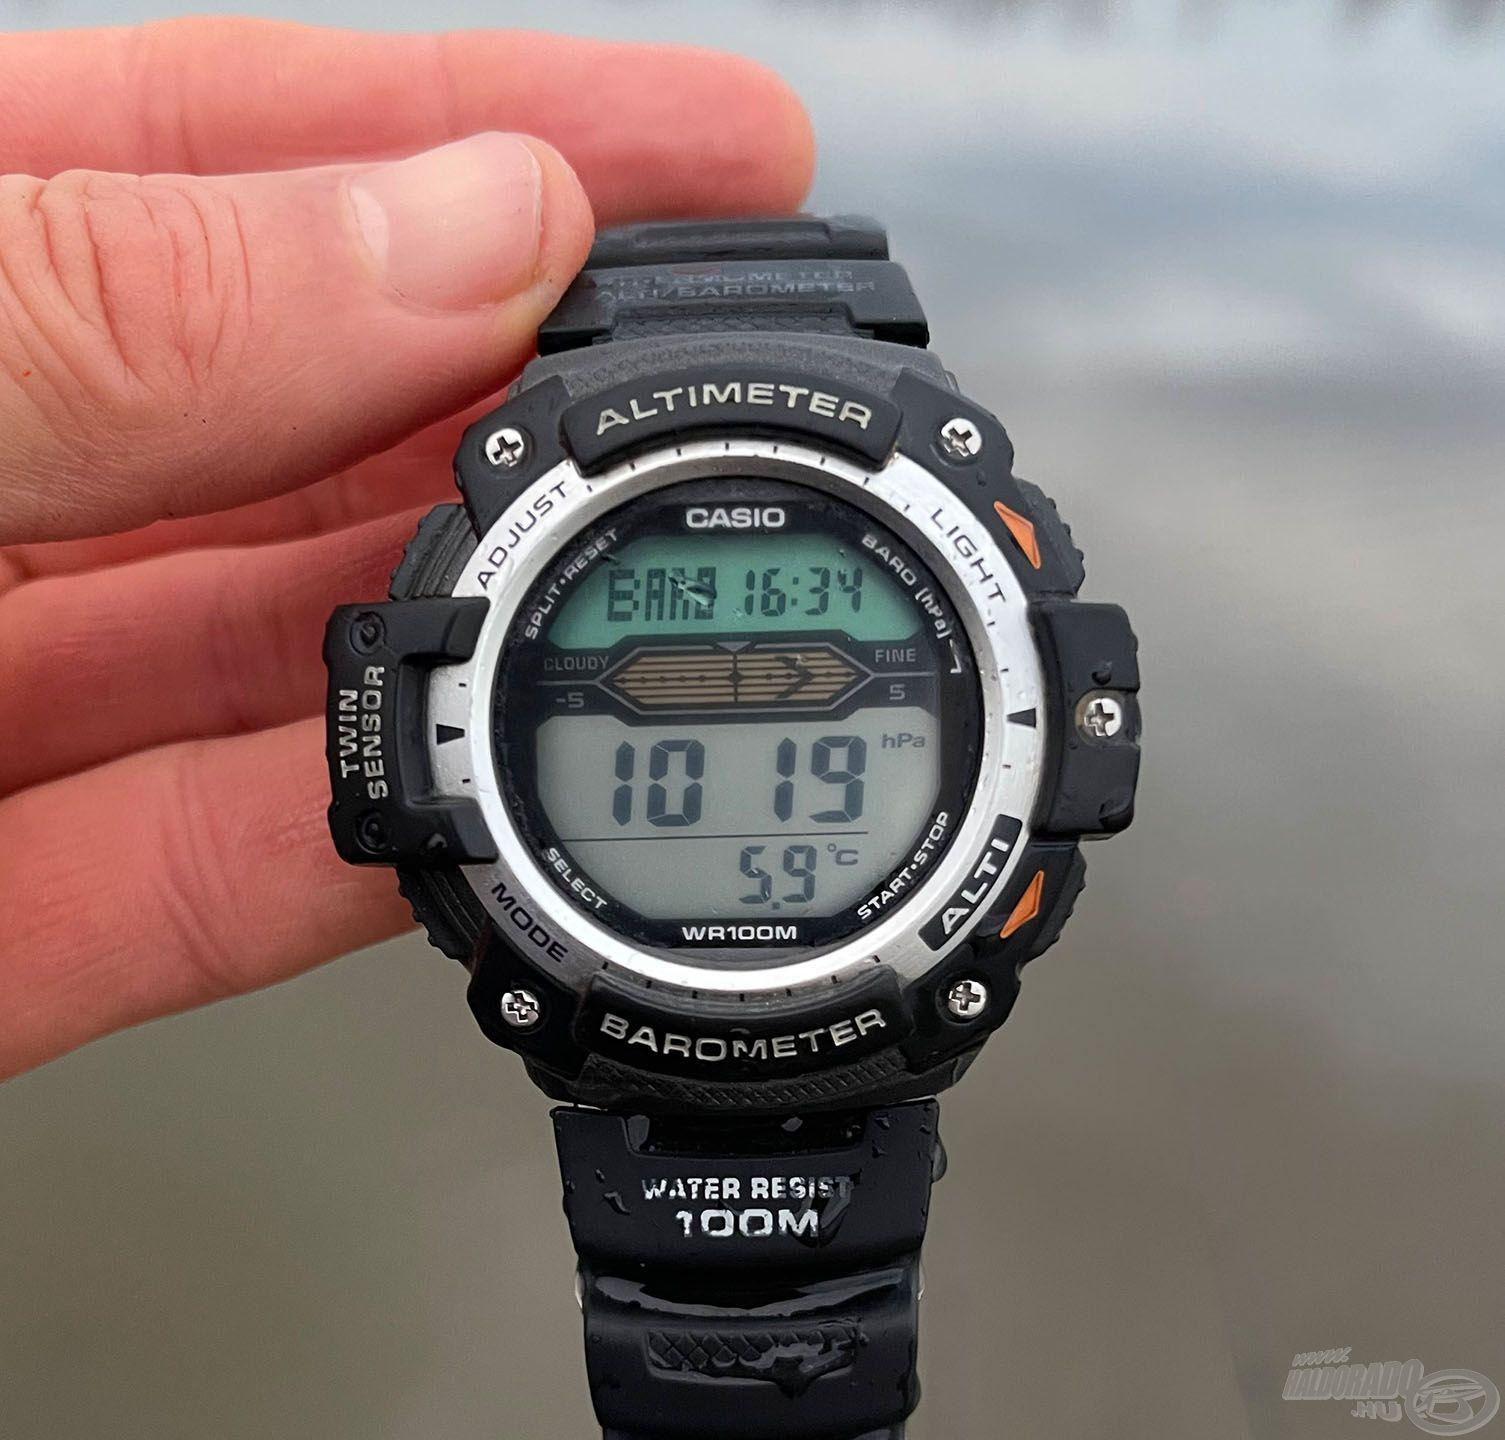 Ezen a napon 5,9 Celsius-fok volt a víz hőmérséklete